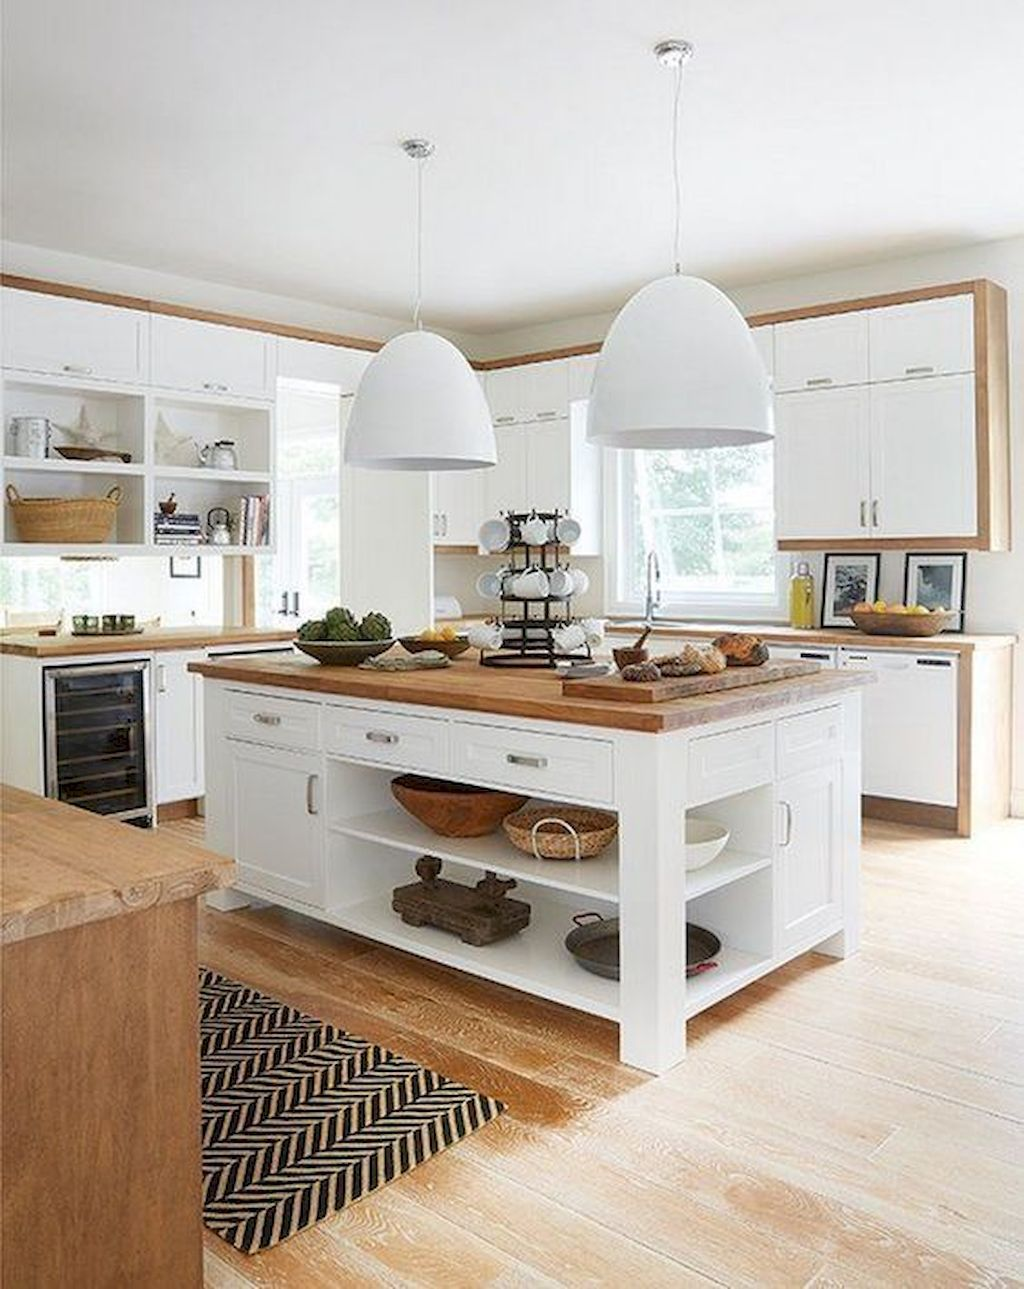 Stunning Kitchen Island Design Ideas kitchens Pinterest